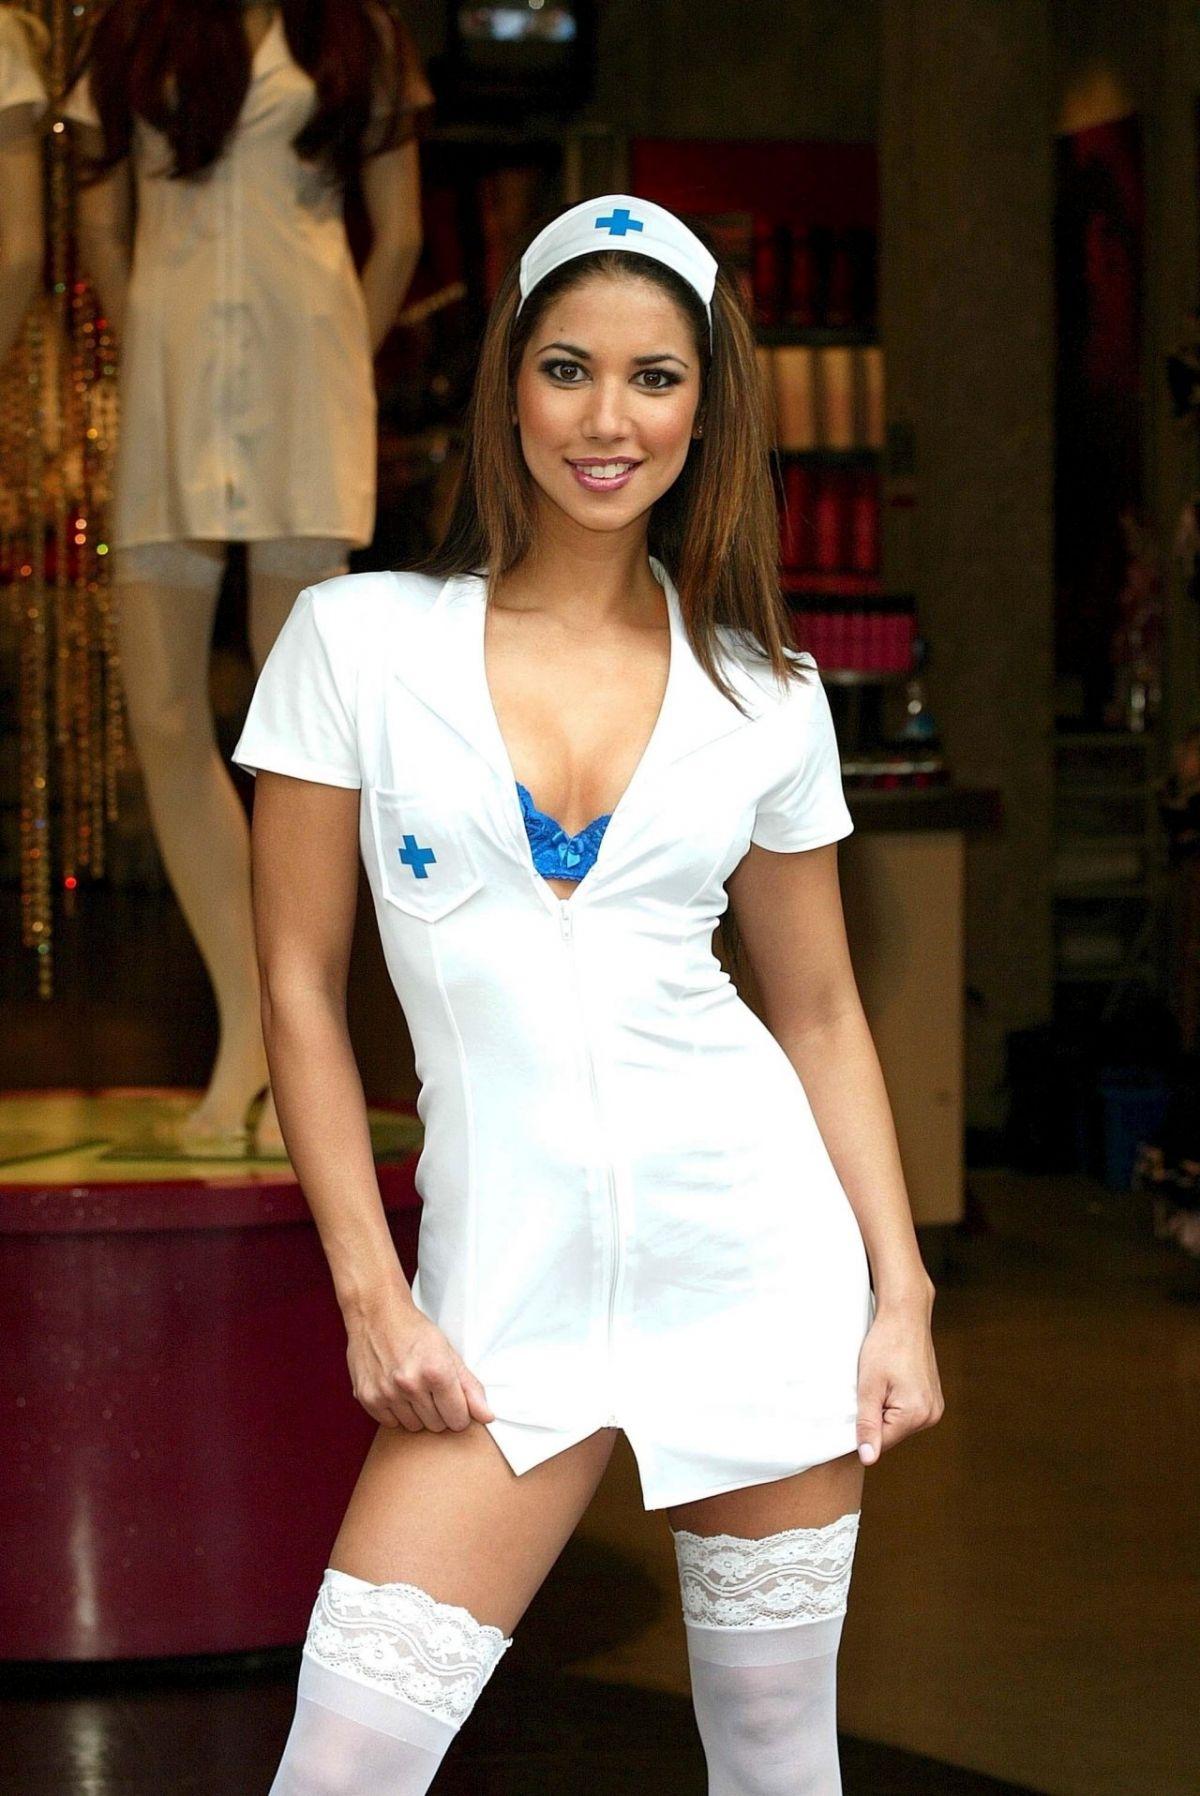 LEILANI DOWDING - Nurse Photoshoot